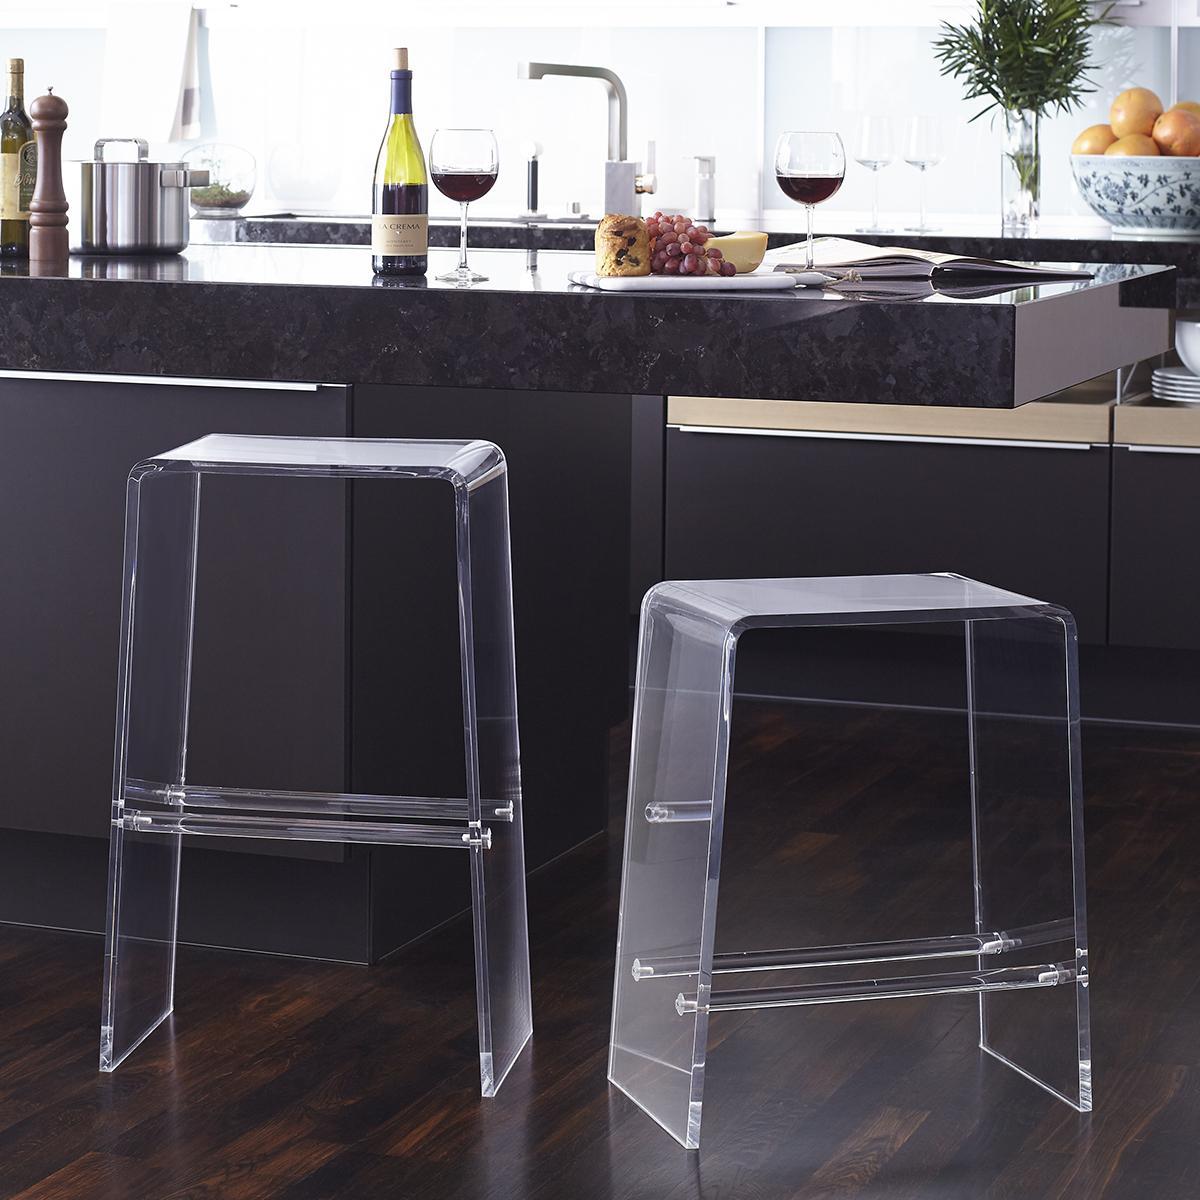 Acrylic Counter Stool - Kitchen Counter Bar Stools | Wisteria